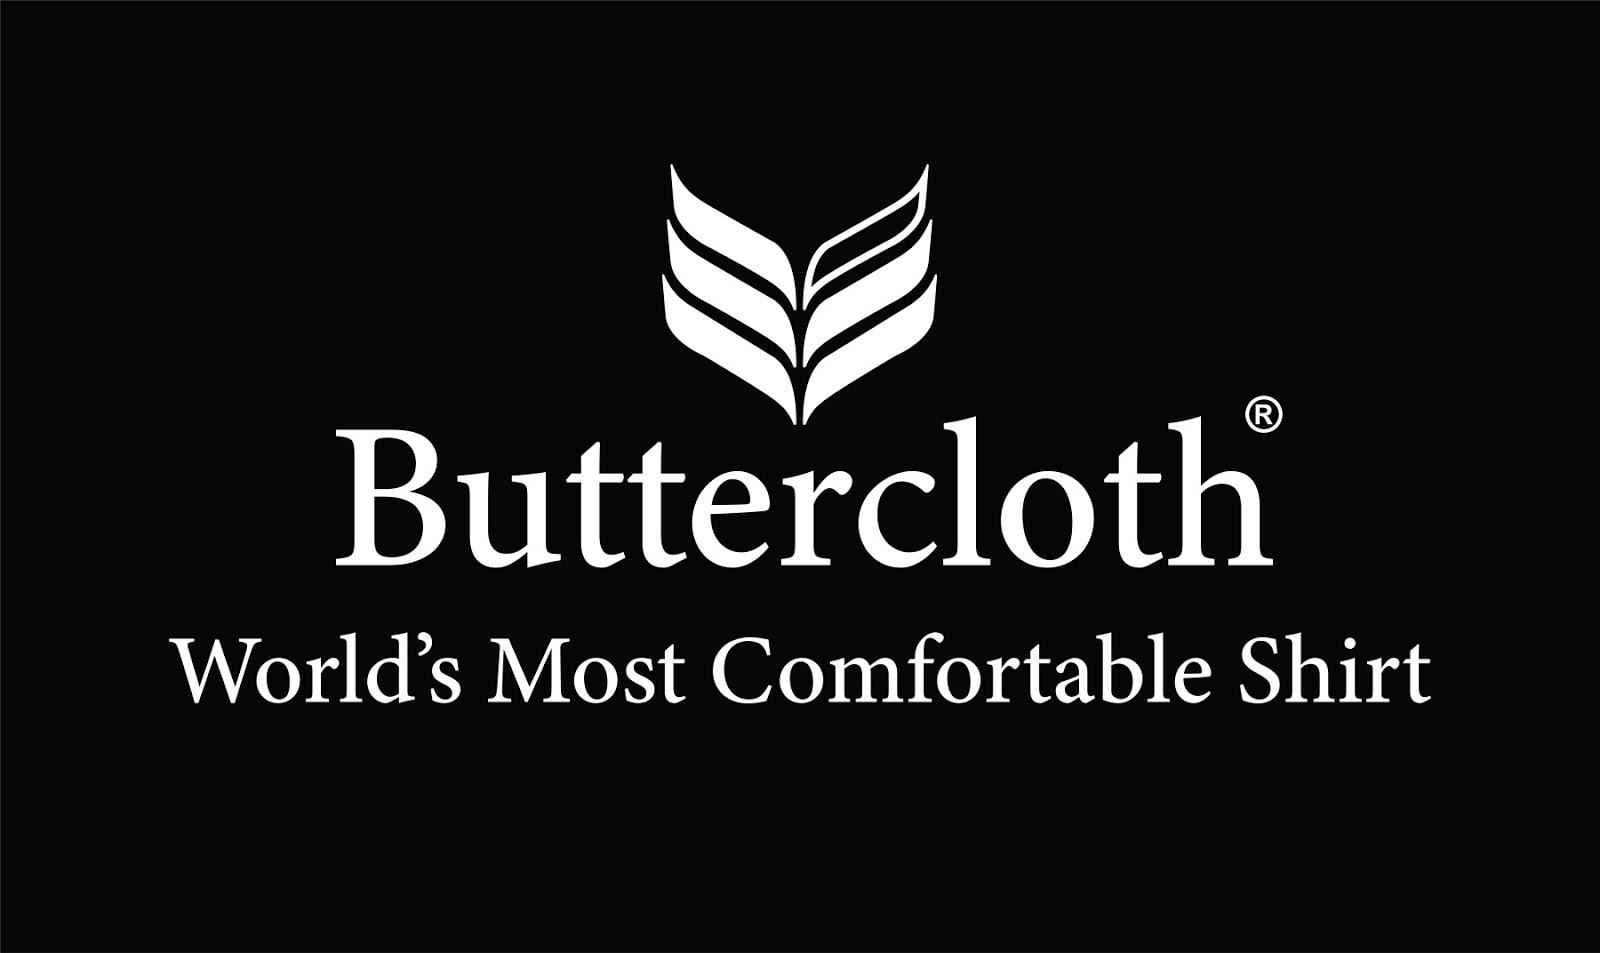 Buttercloth's logo